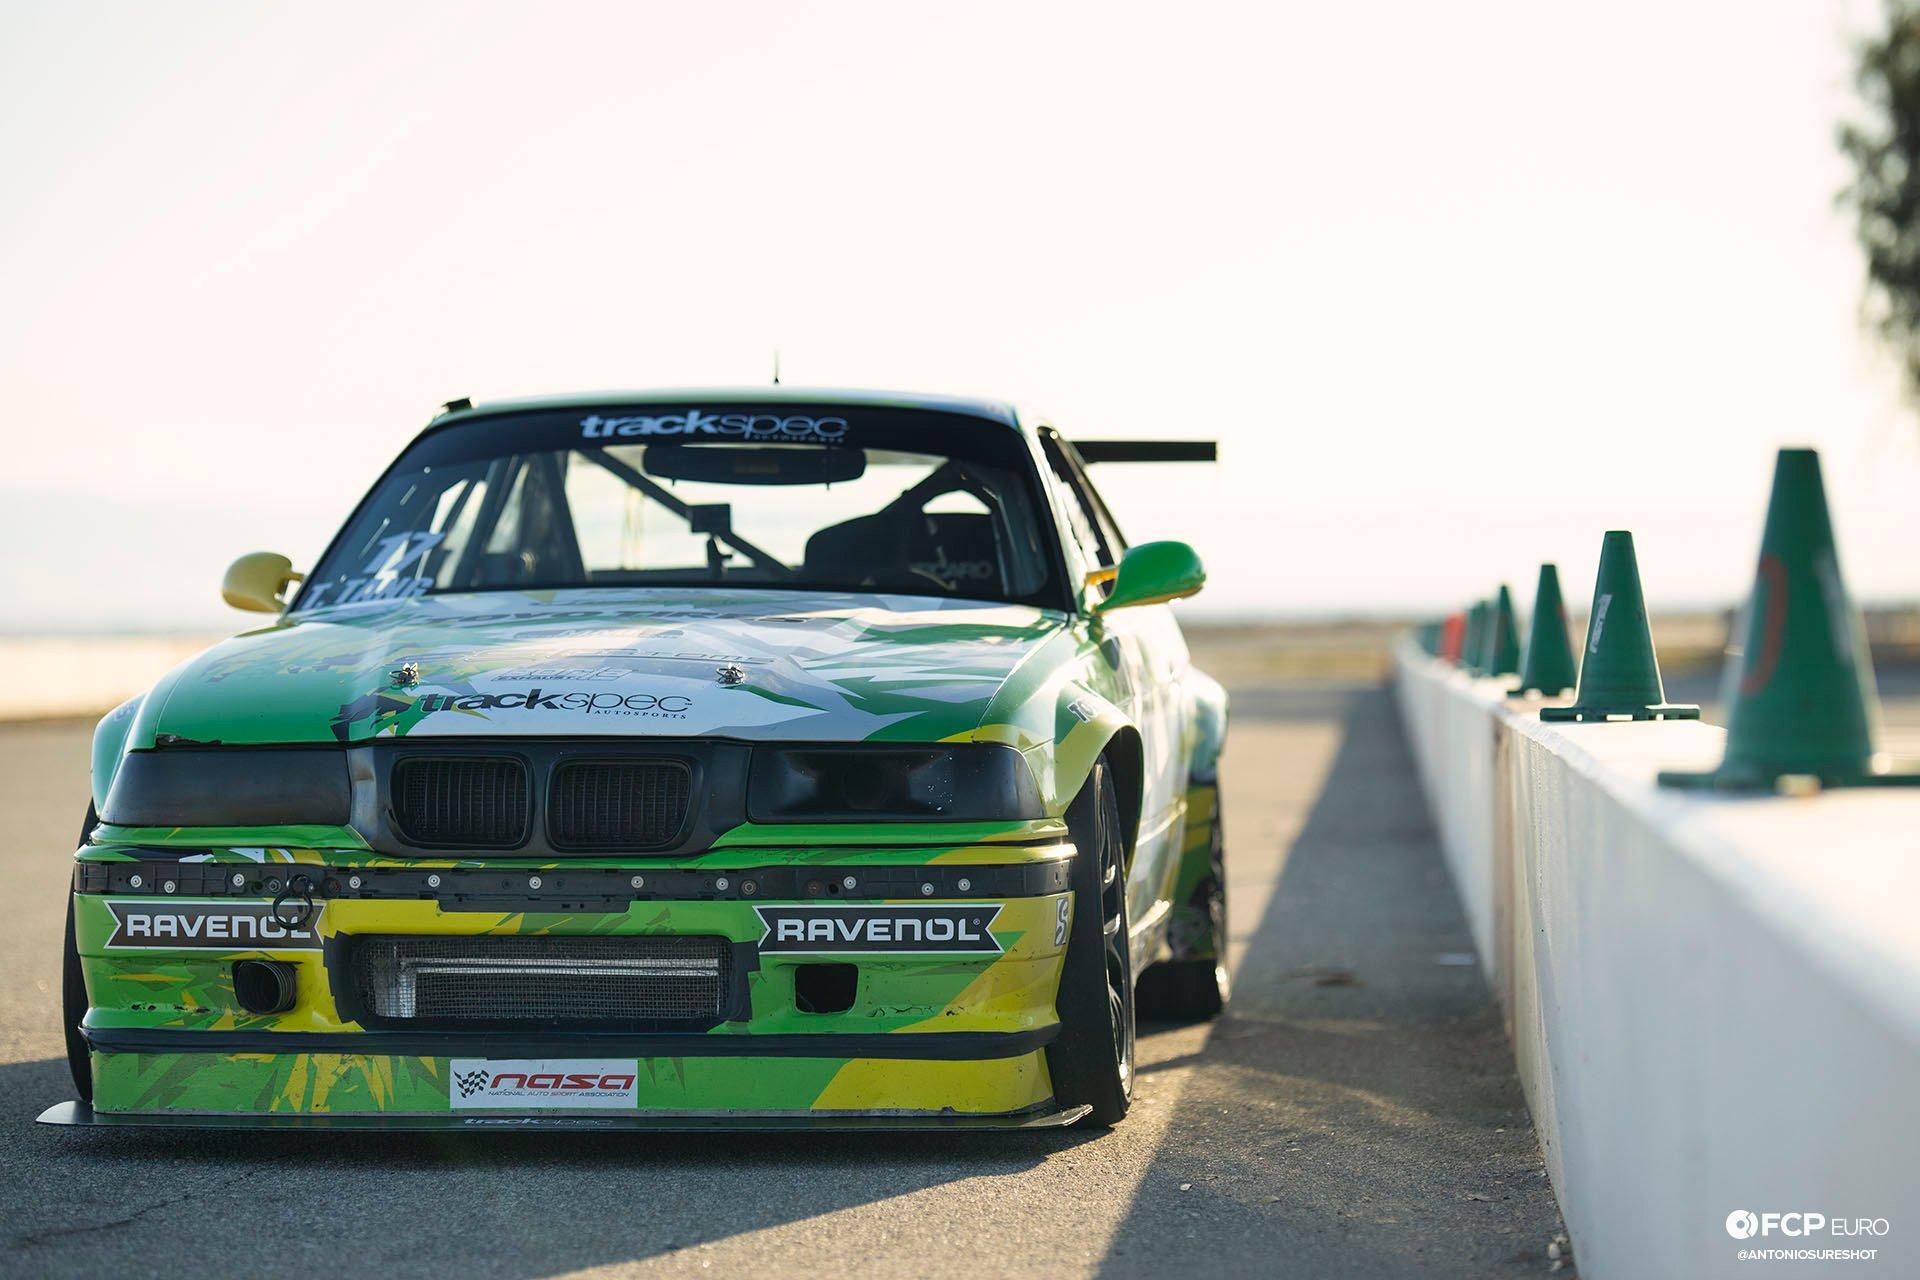 BMW E36 M3 S54 Swapped NASA ST4 Super Touring